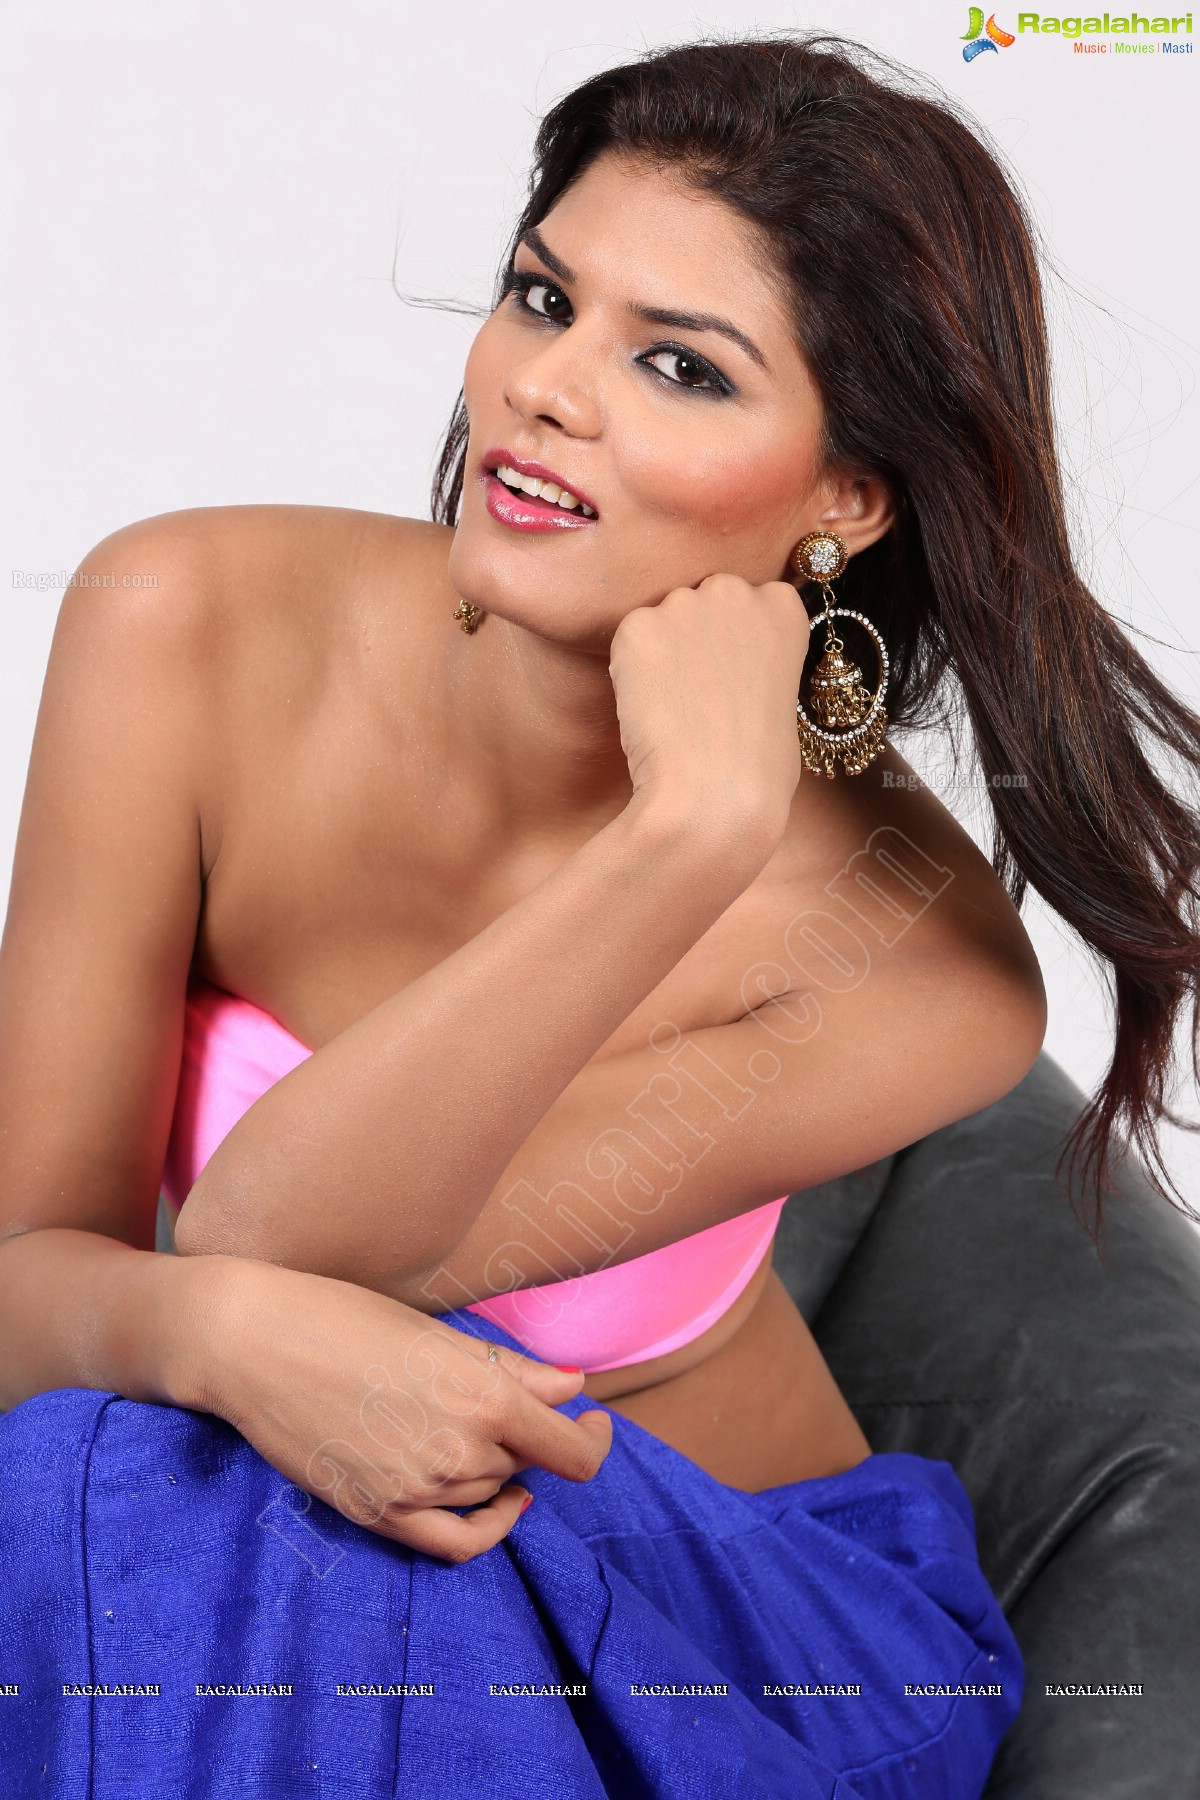 Pooja Tomar (Exclusive)